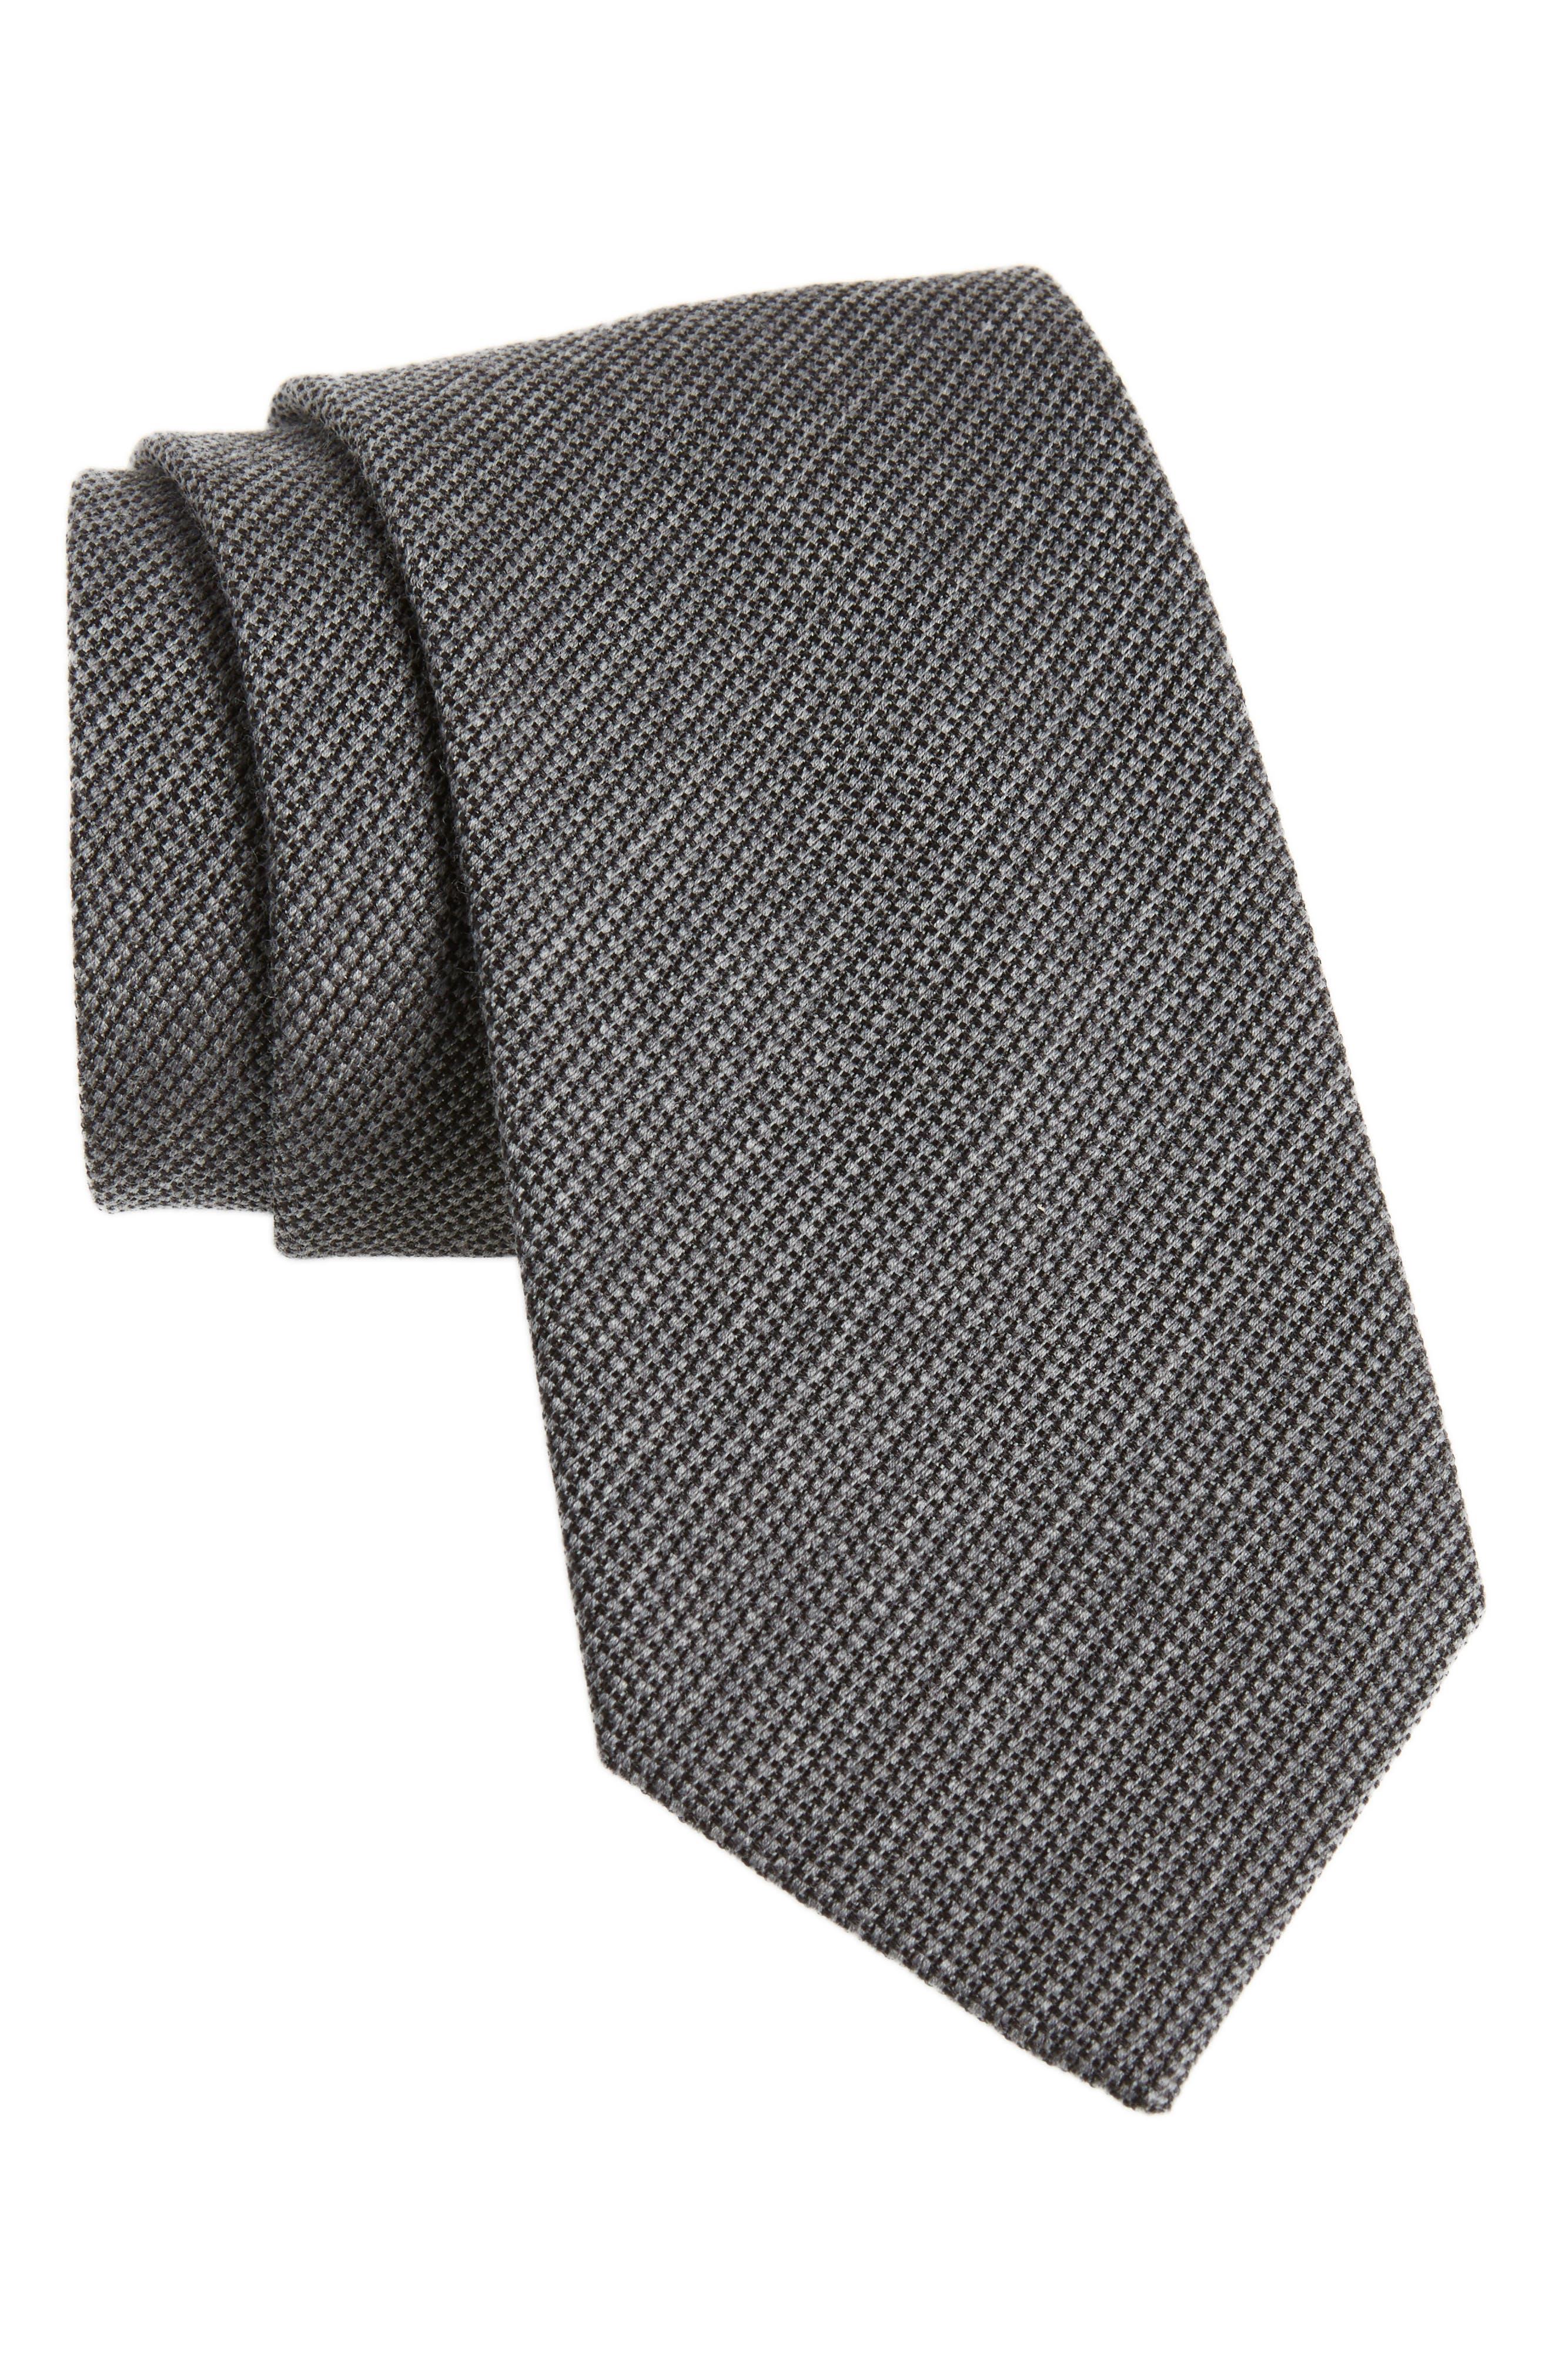 Wool & Silk Tie,                         Main,                         color, 032